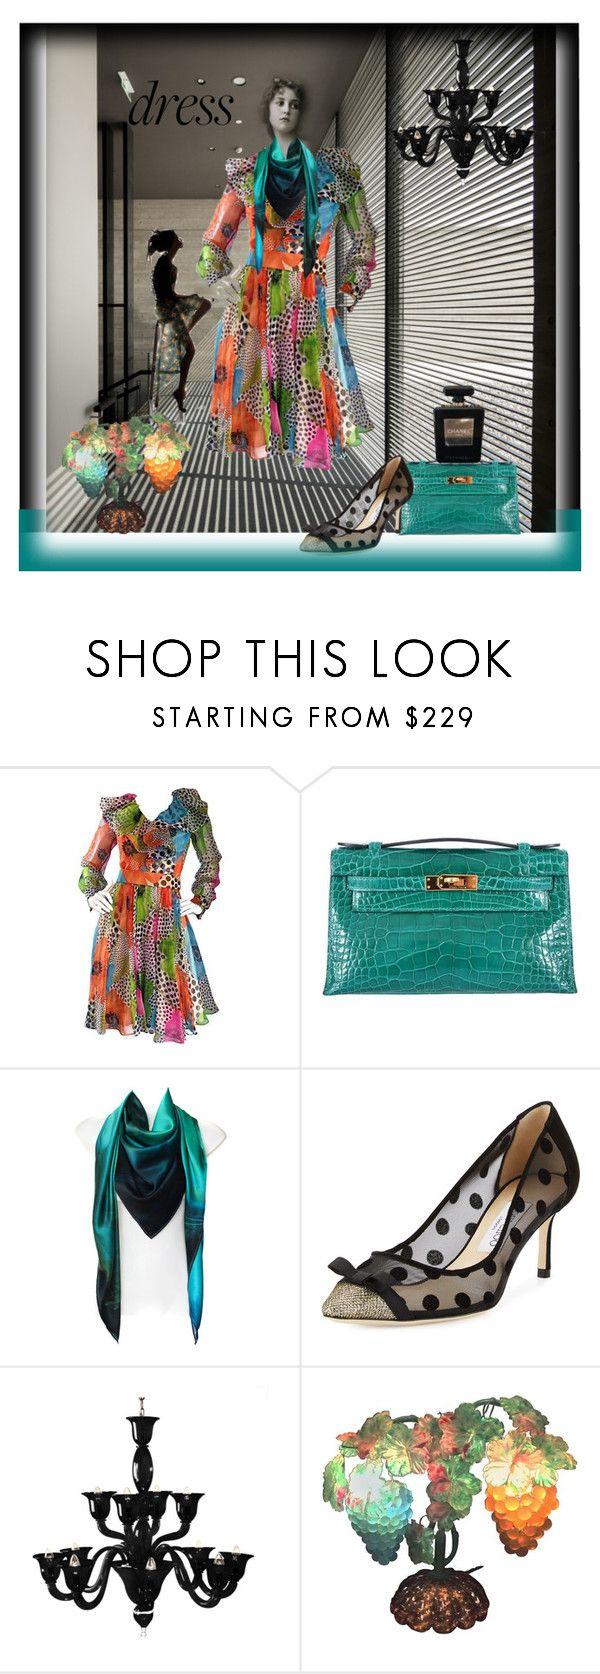 """jasinta-3308"" by jasintasss ❤ liked on Polyvore featuring Hermès, Leona Lengyel, Jimmy Choo, Voltolina, Jean-Paul Gaultier and Chanel"